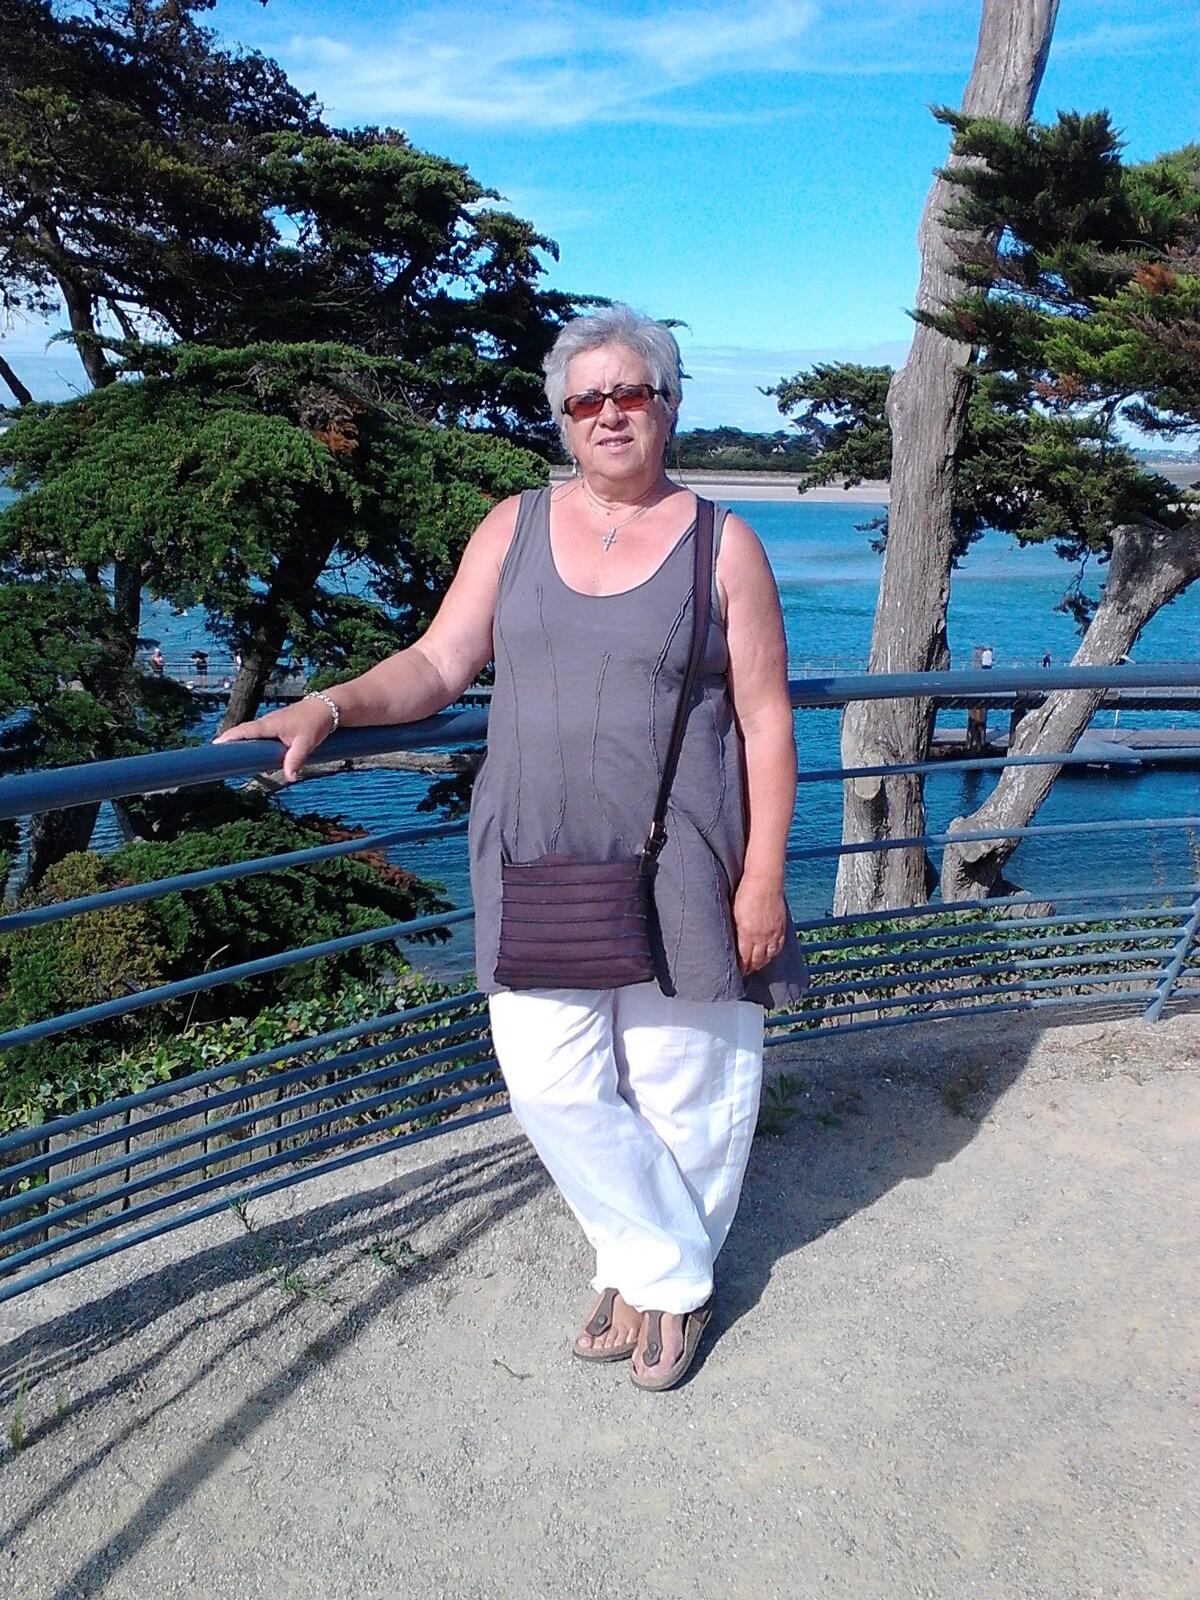 Martine from Grasse